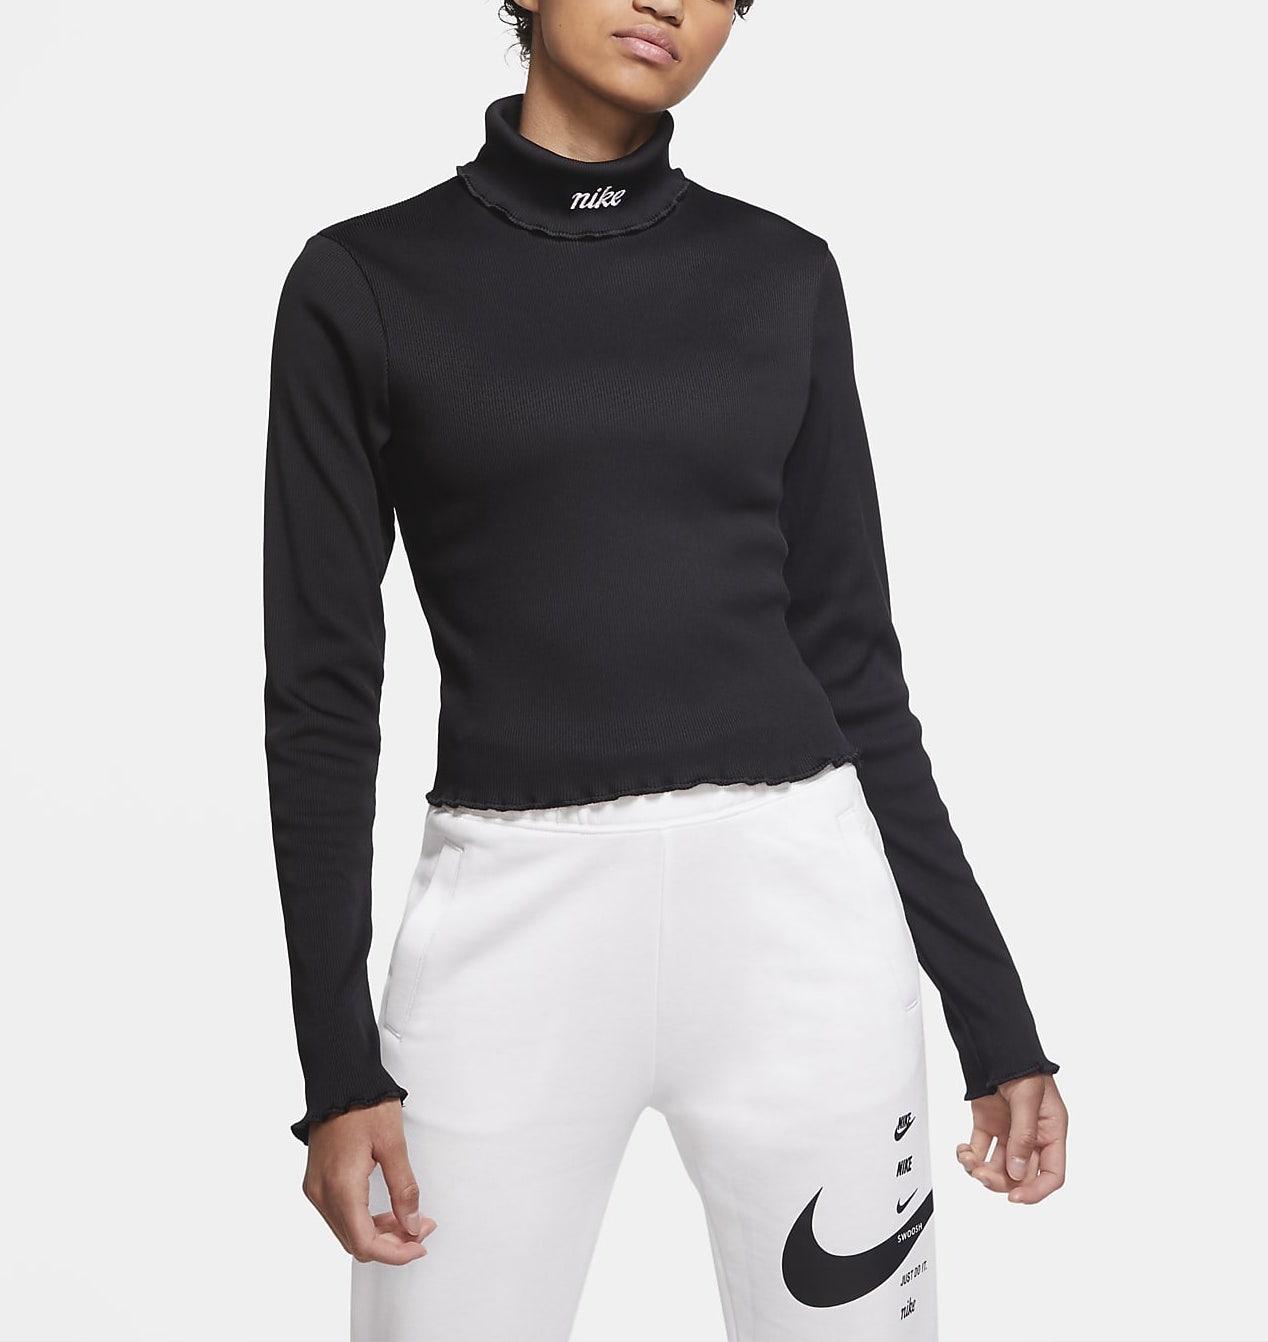 Nike Ribbed Long Sleeve Top Black